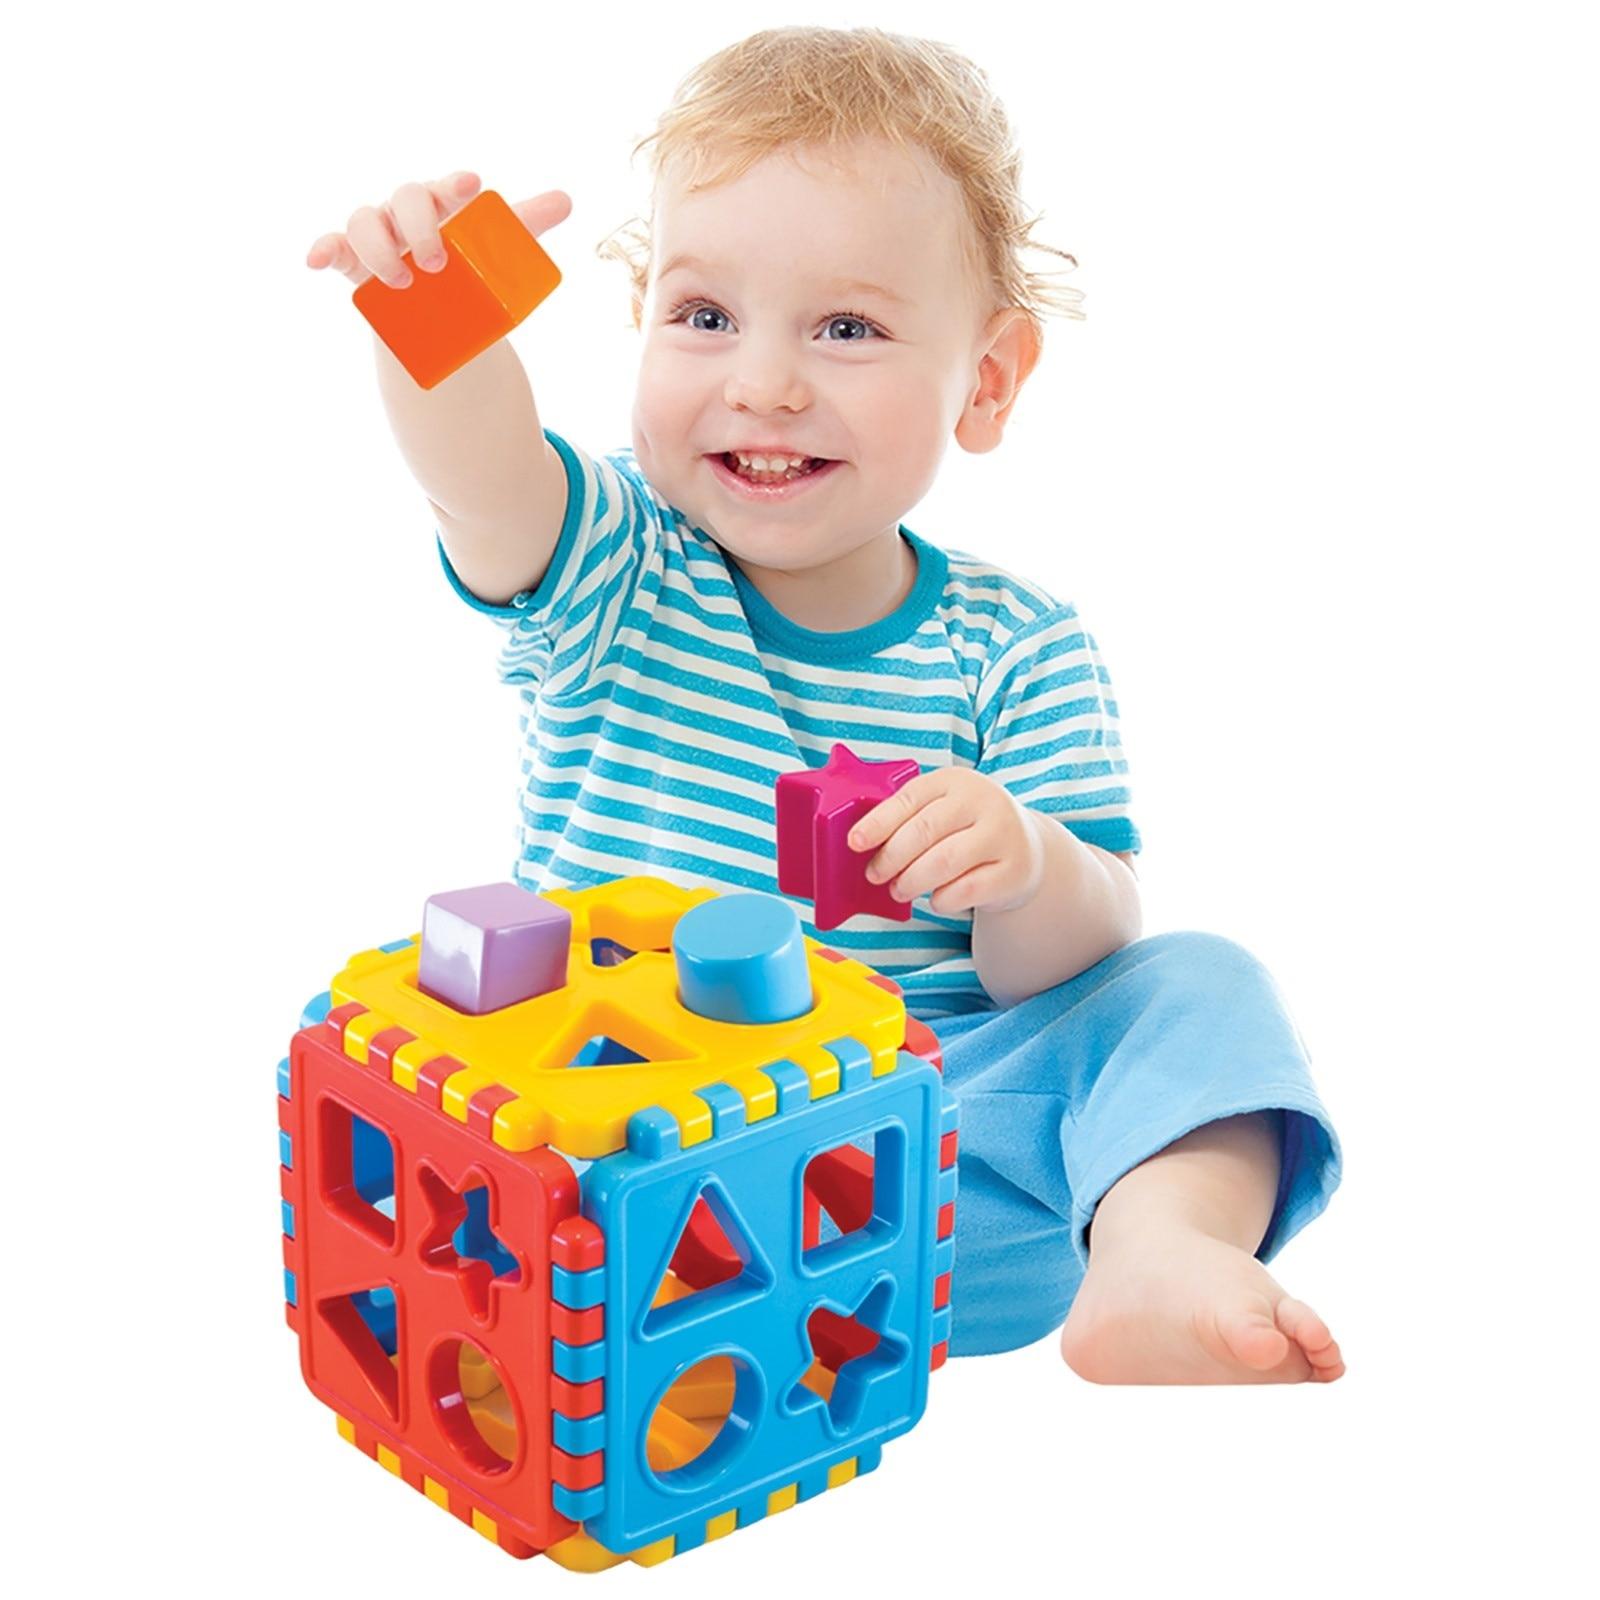 Ebebek Dede Baby Shape Sorter Puzzle